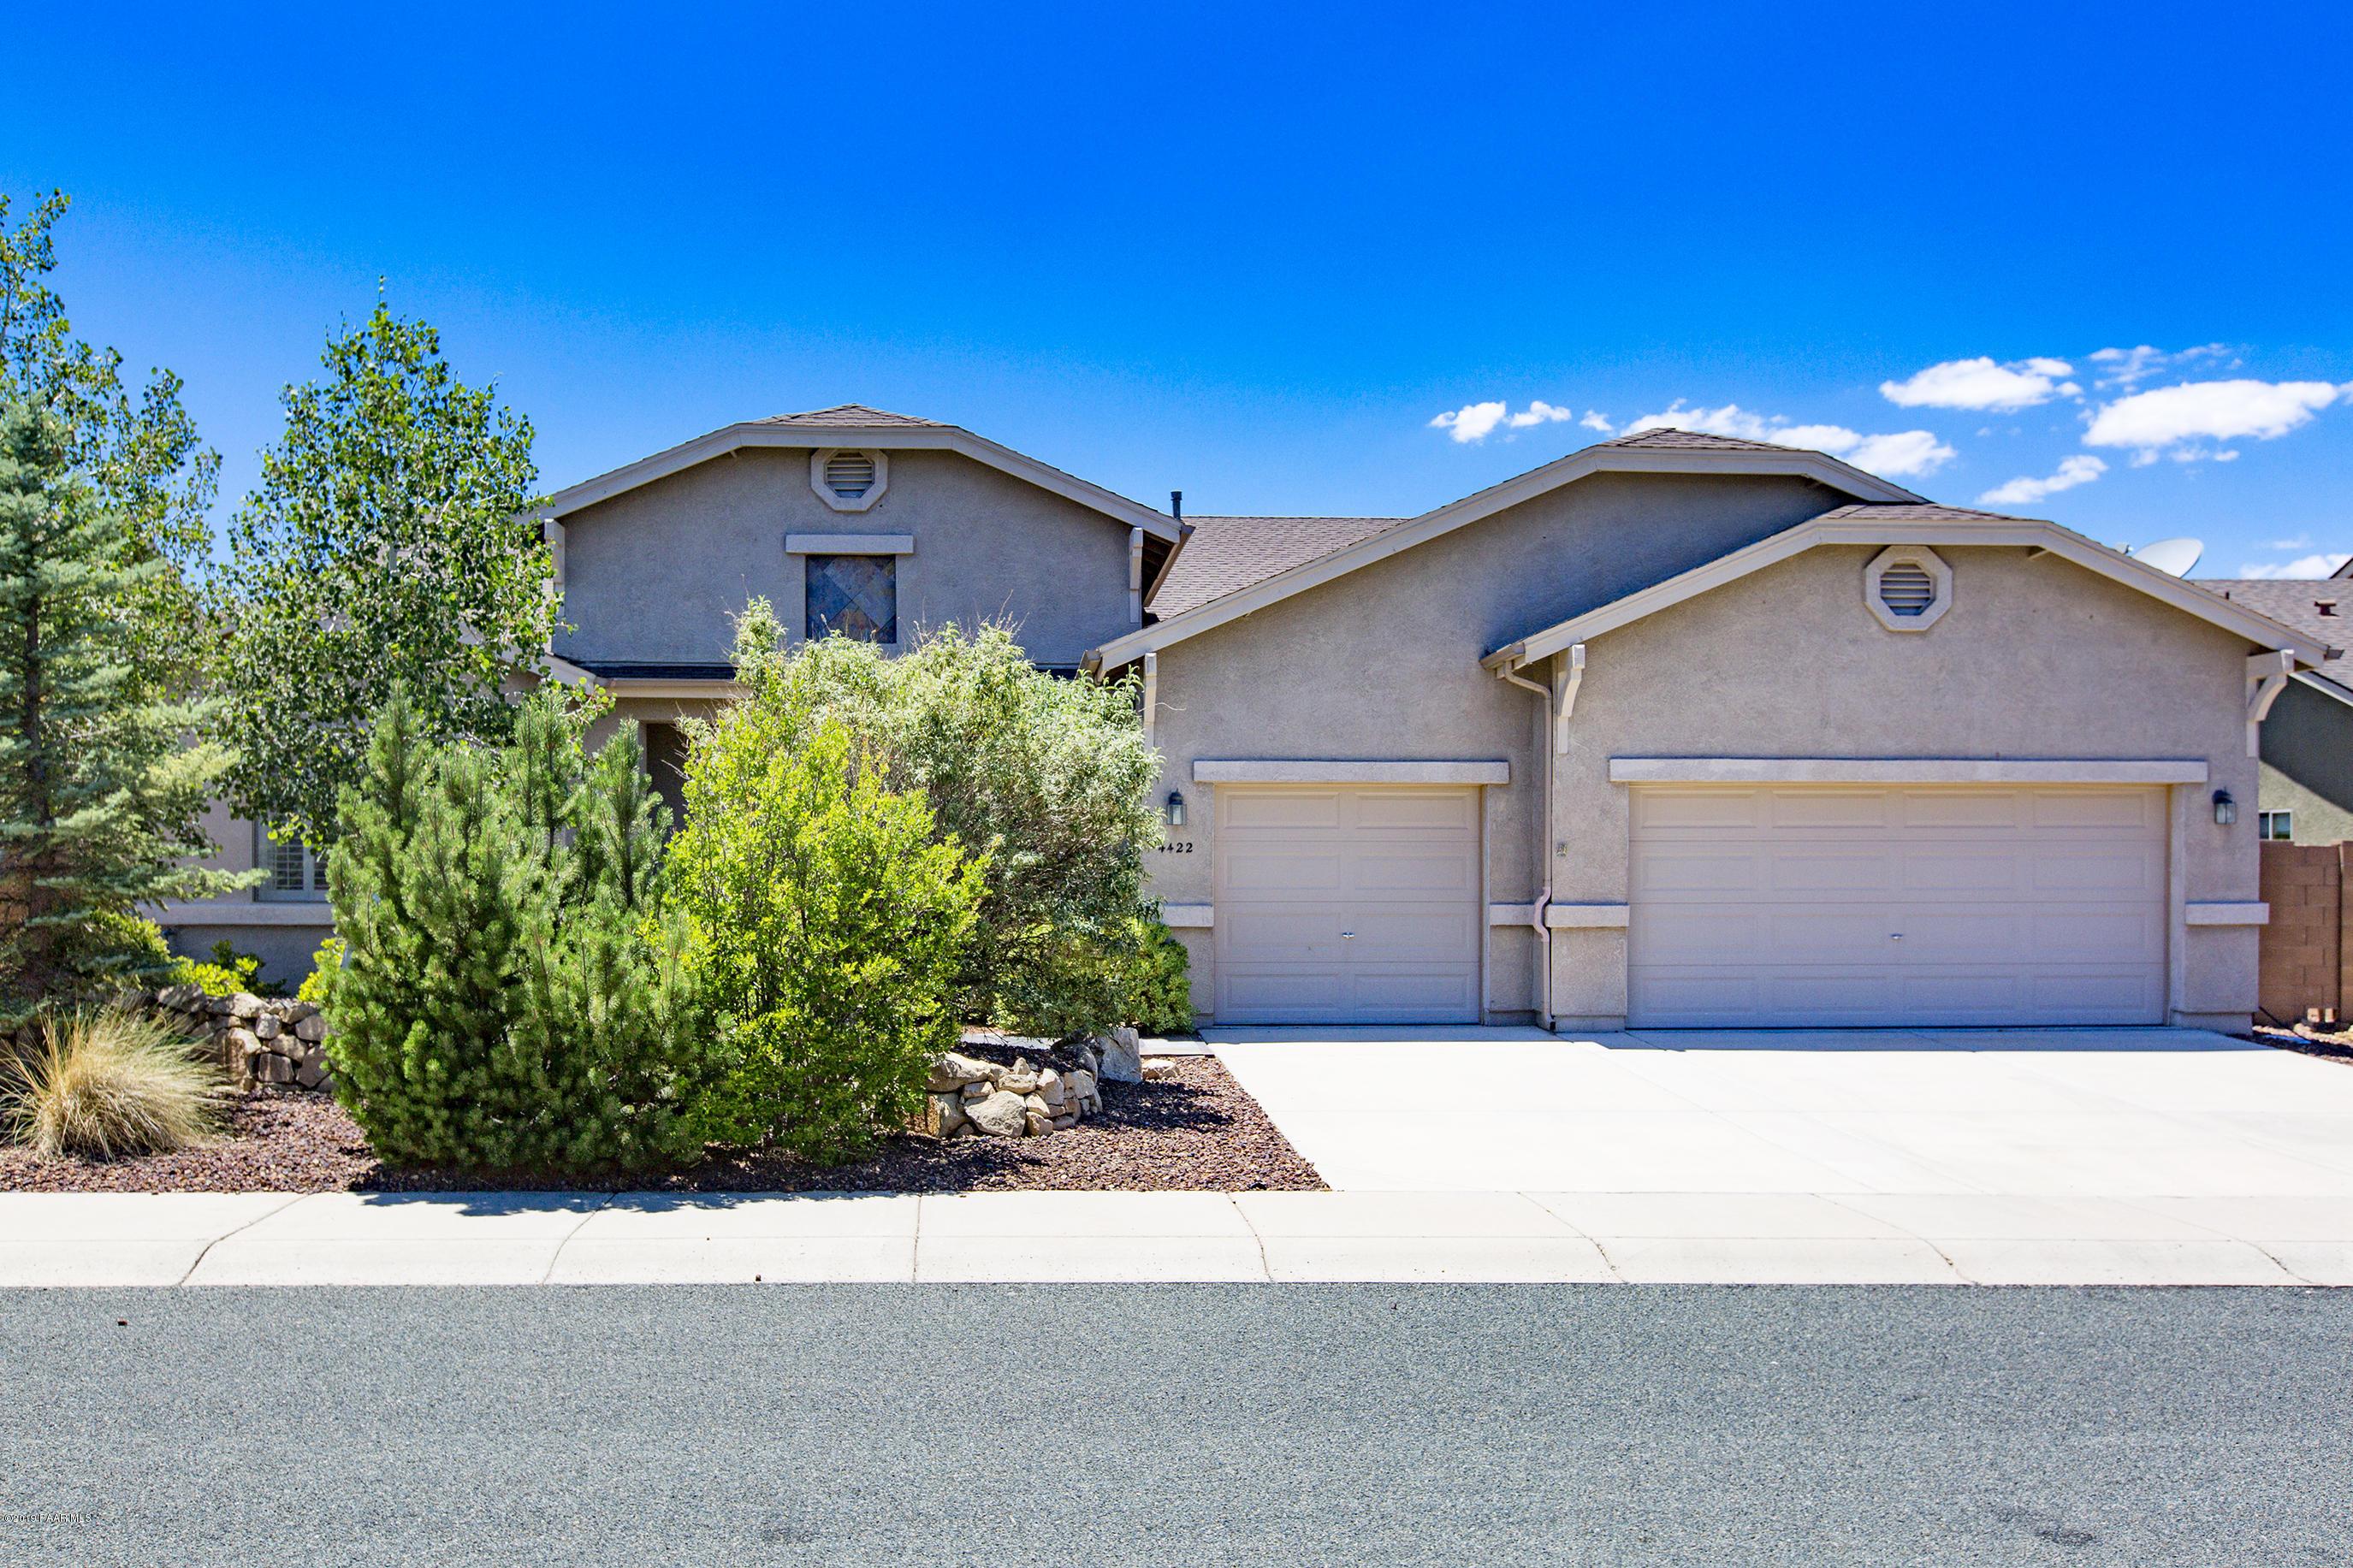 Photo of 4422 Grafton, Prescott Valley, AZ 86314